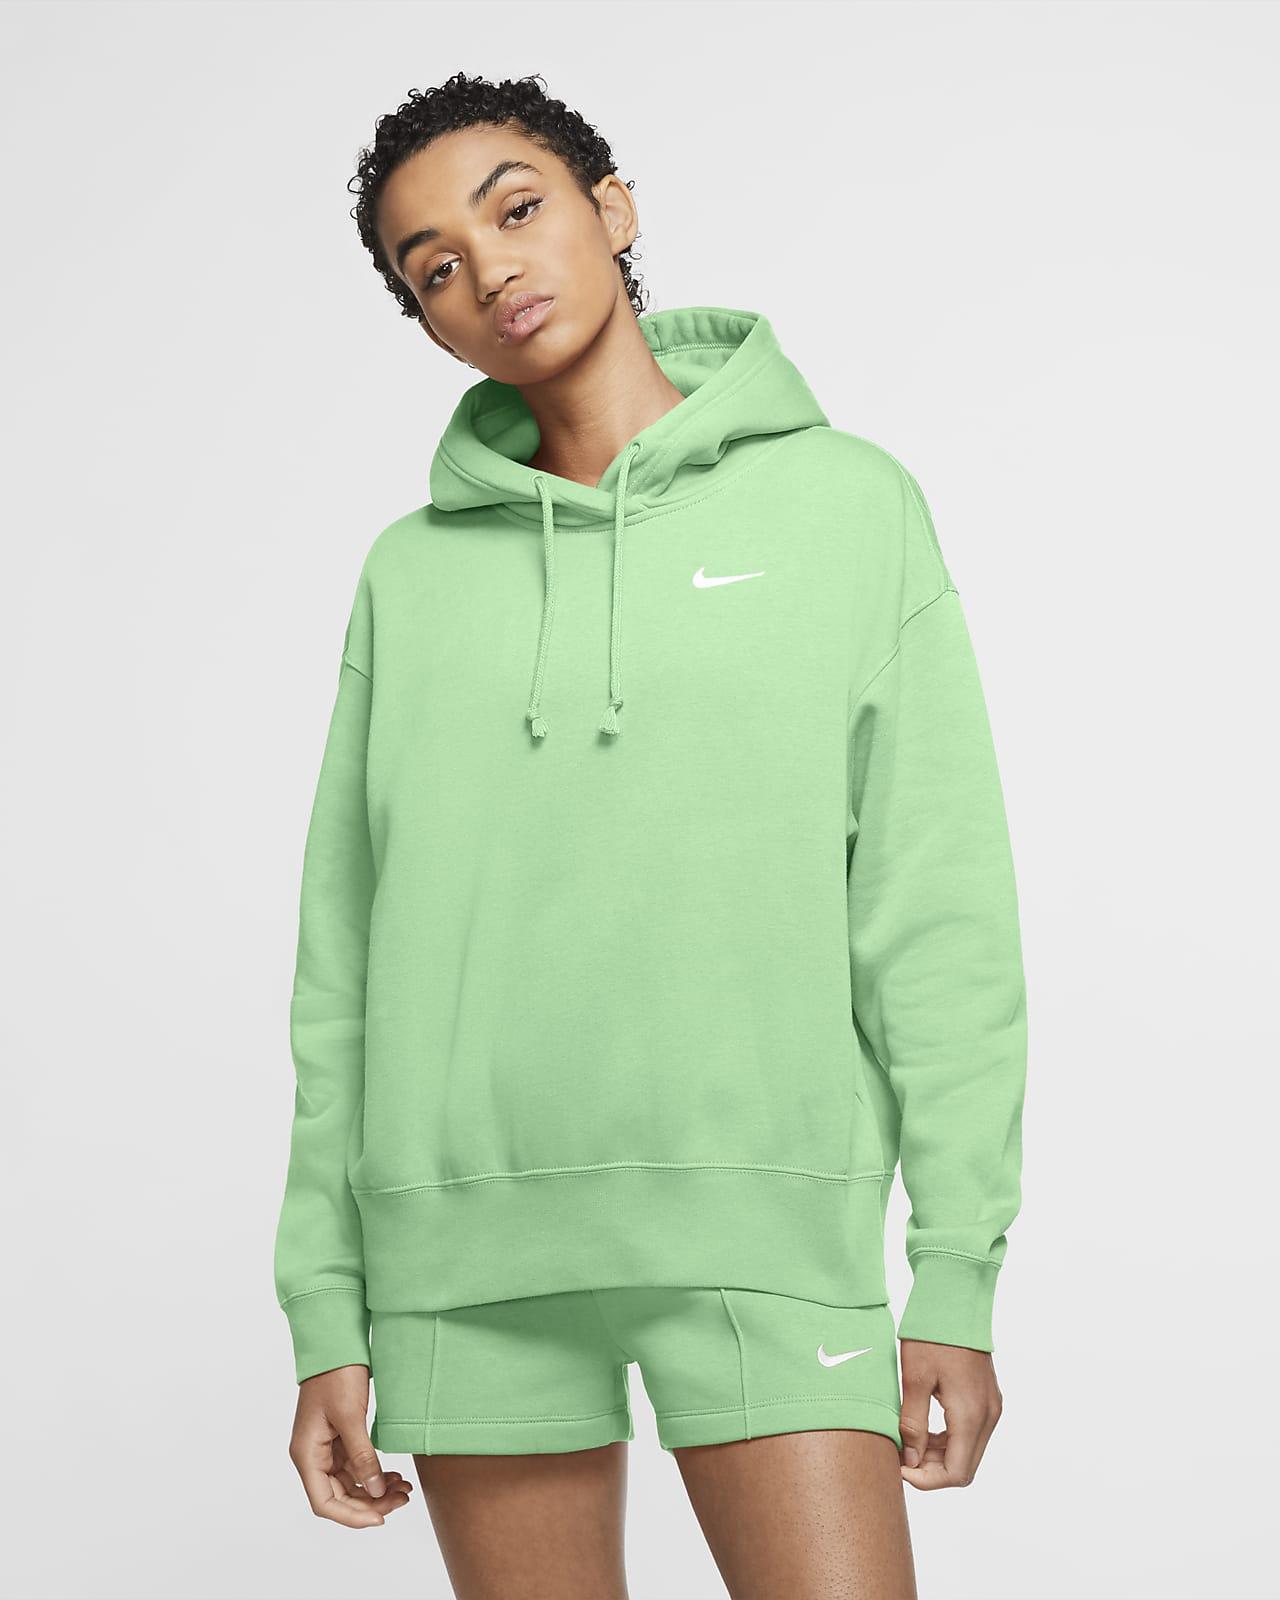 Sudadera con capucha de vellón para mujer Nike Sportswear